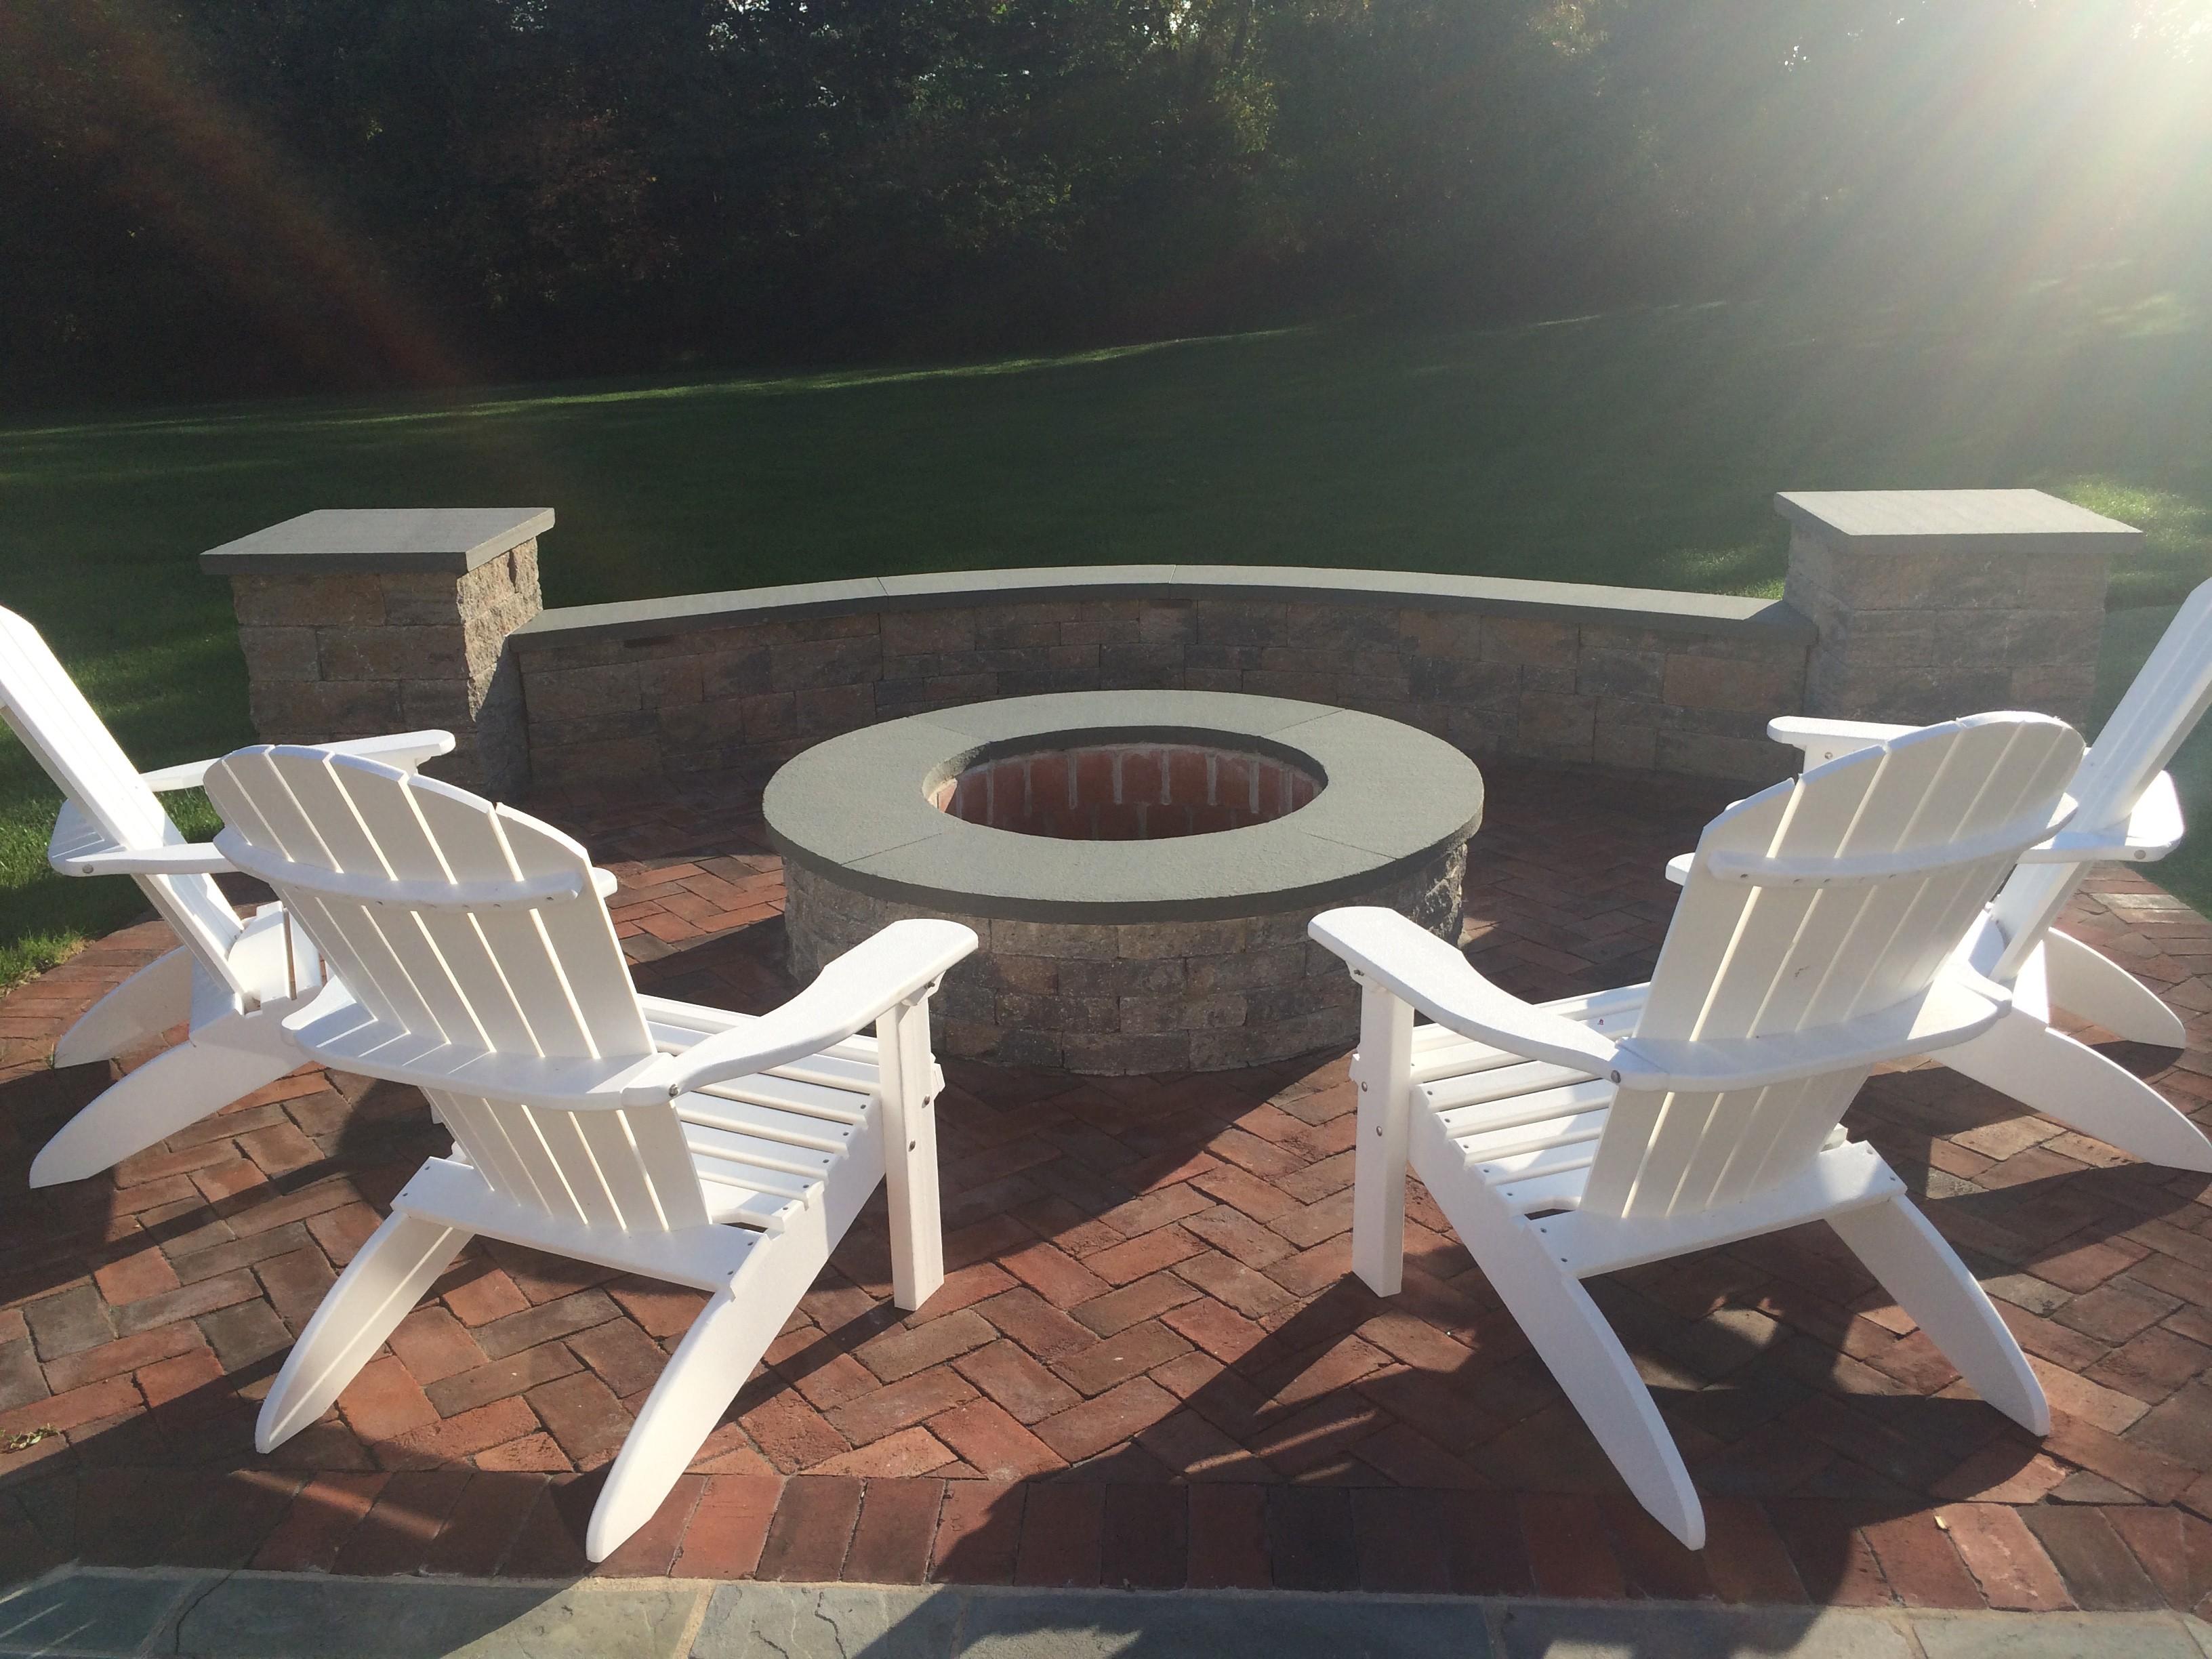 fire pit, seat wall, patio, pillar